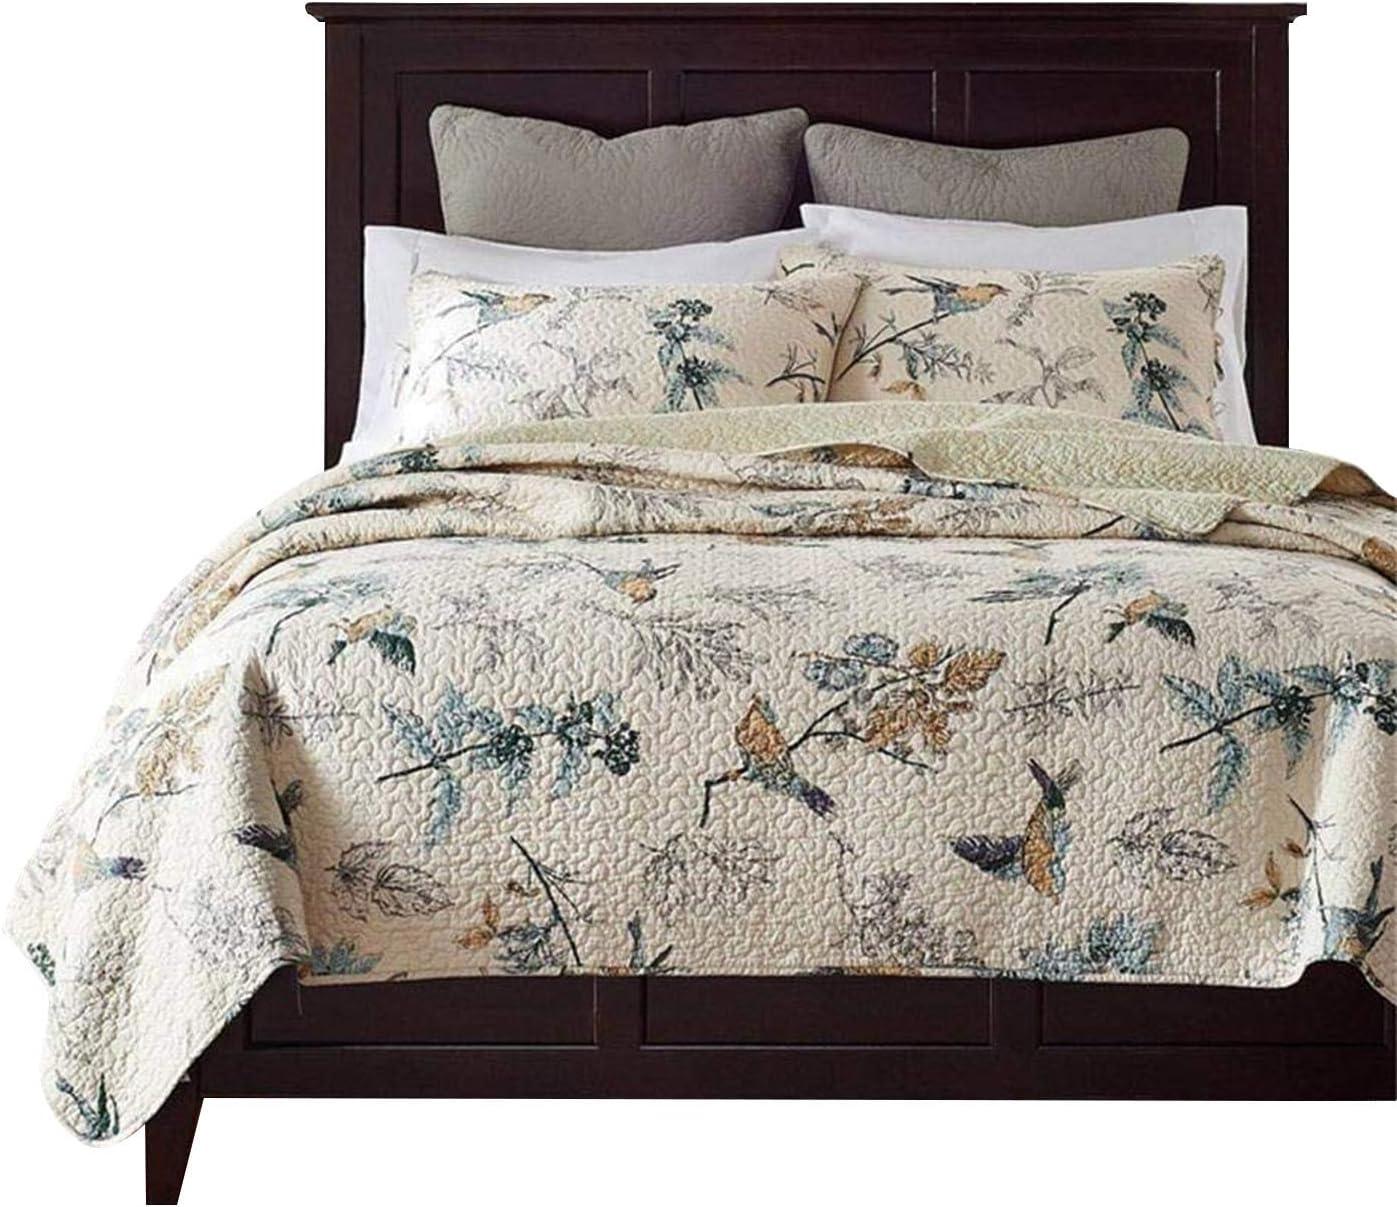 - Amazon.com: Brandream Twin Size Comforter Set Cotton Birds